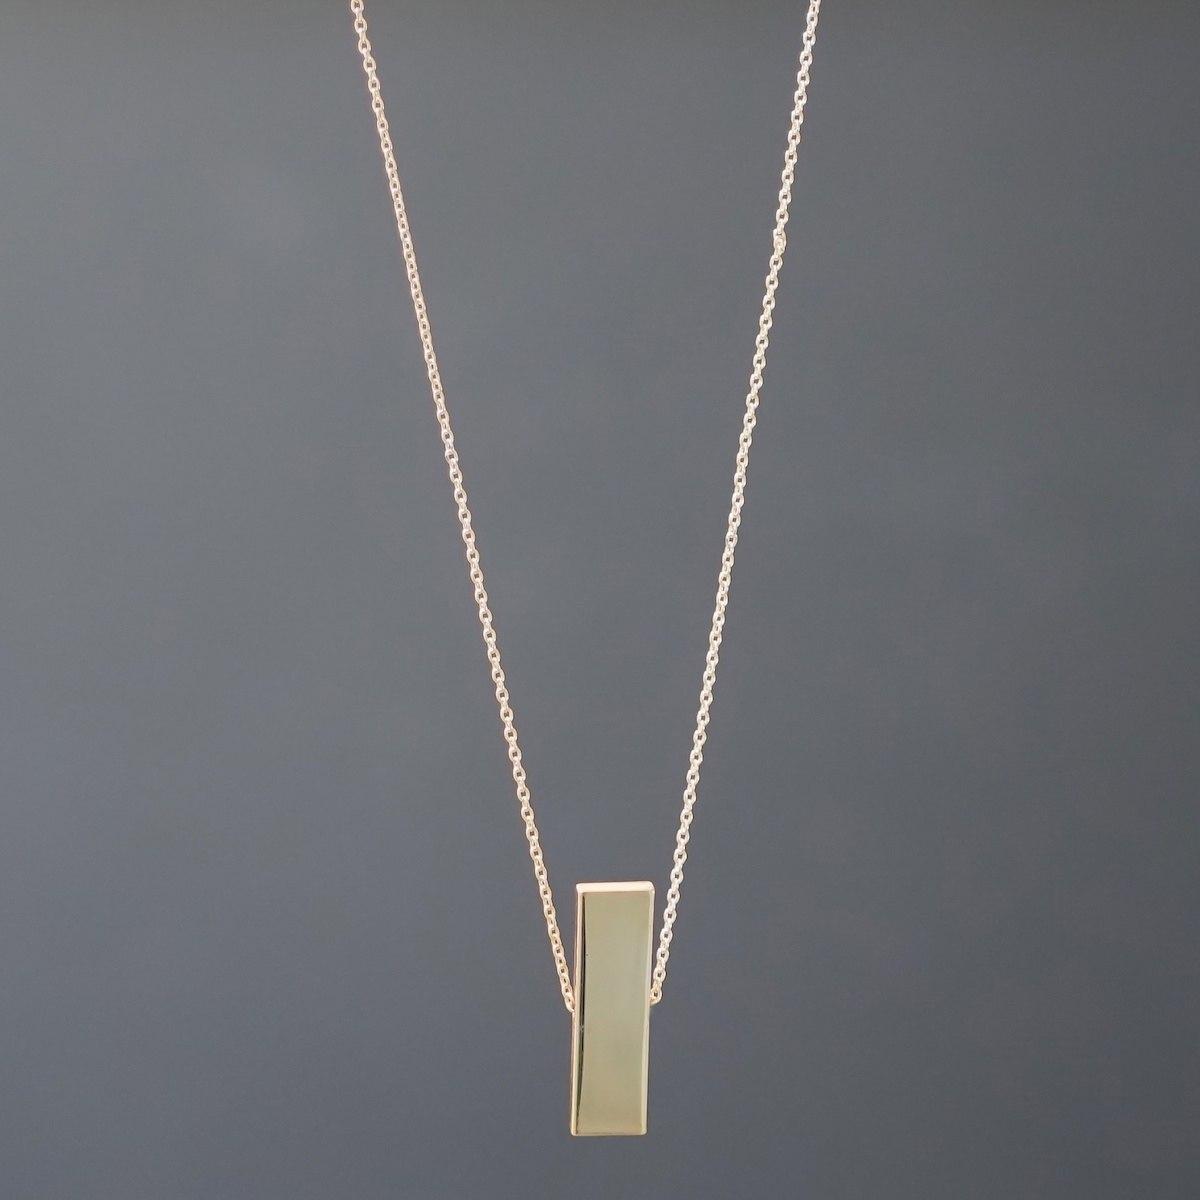 Men's Solid Gold Necklace